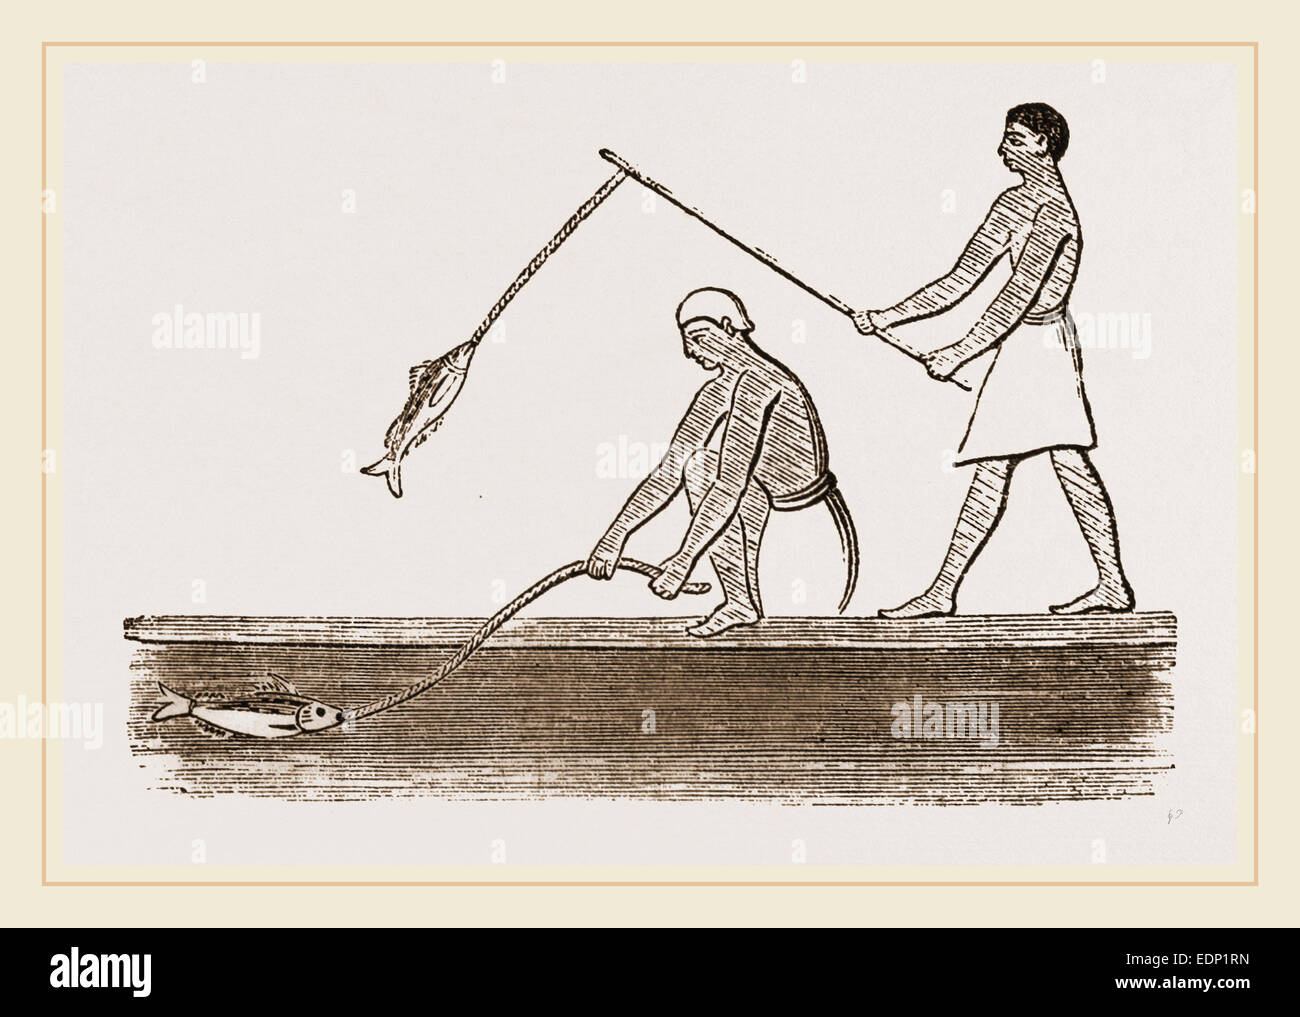 Ancient Egyptians angling, Egypt - Stock Image